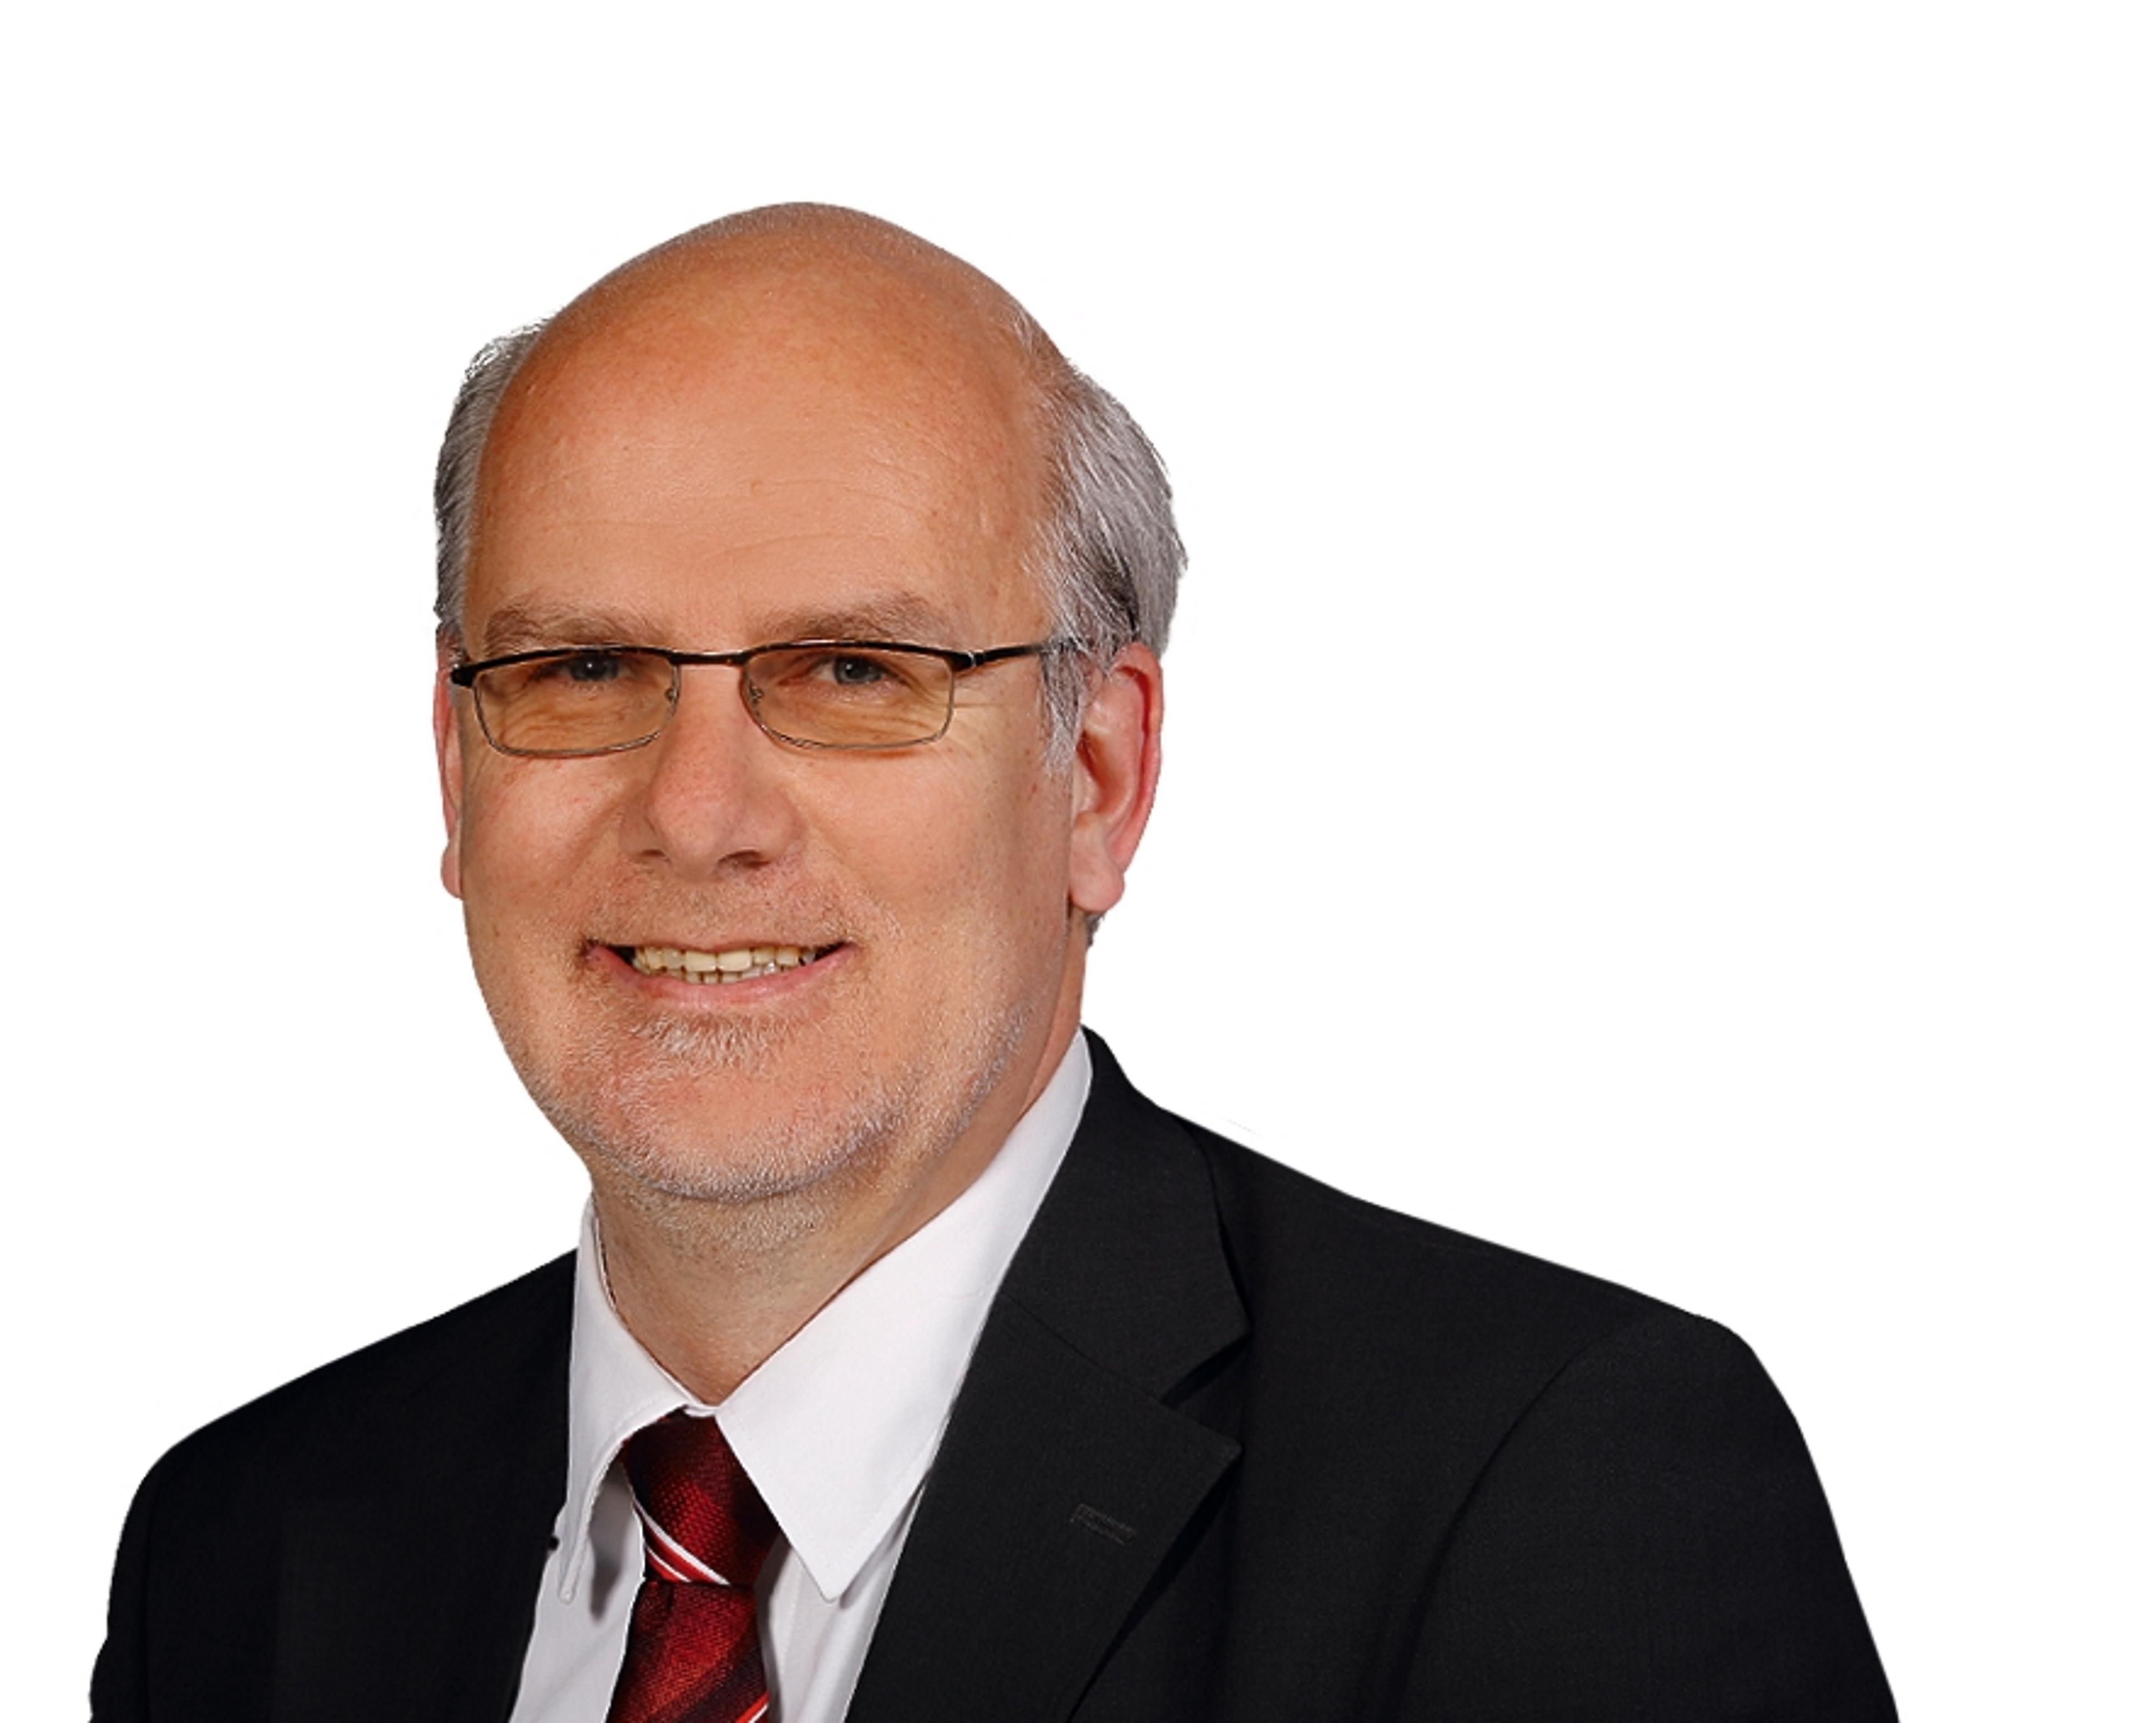 Dipl.-Ing. Robert Wilmes, System Management PLCnext, Phoenix Contact Electronics GmbH